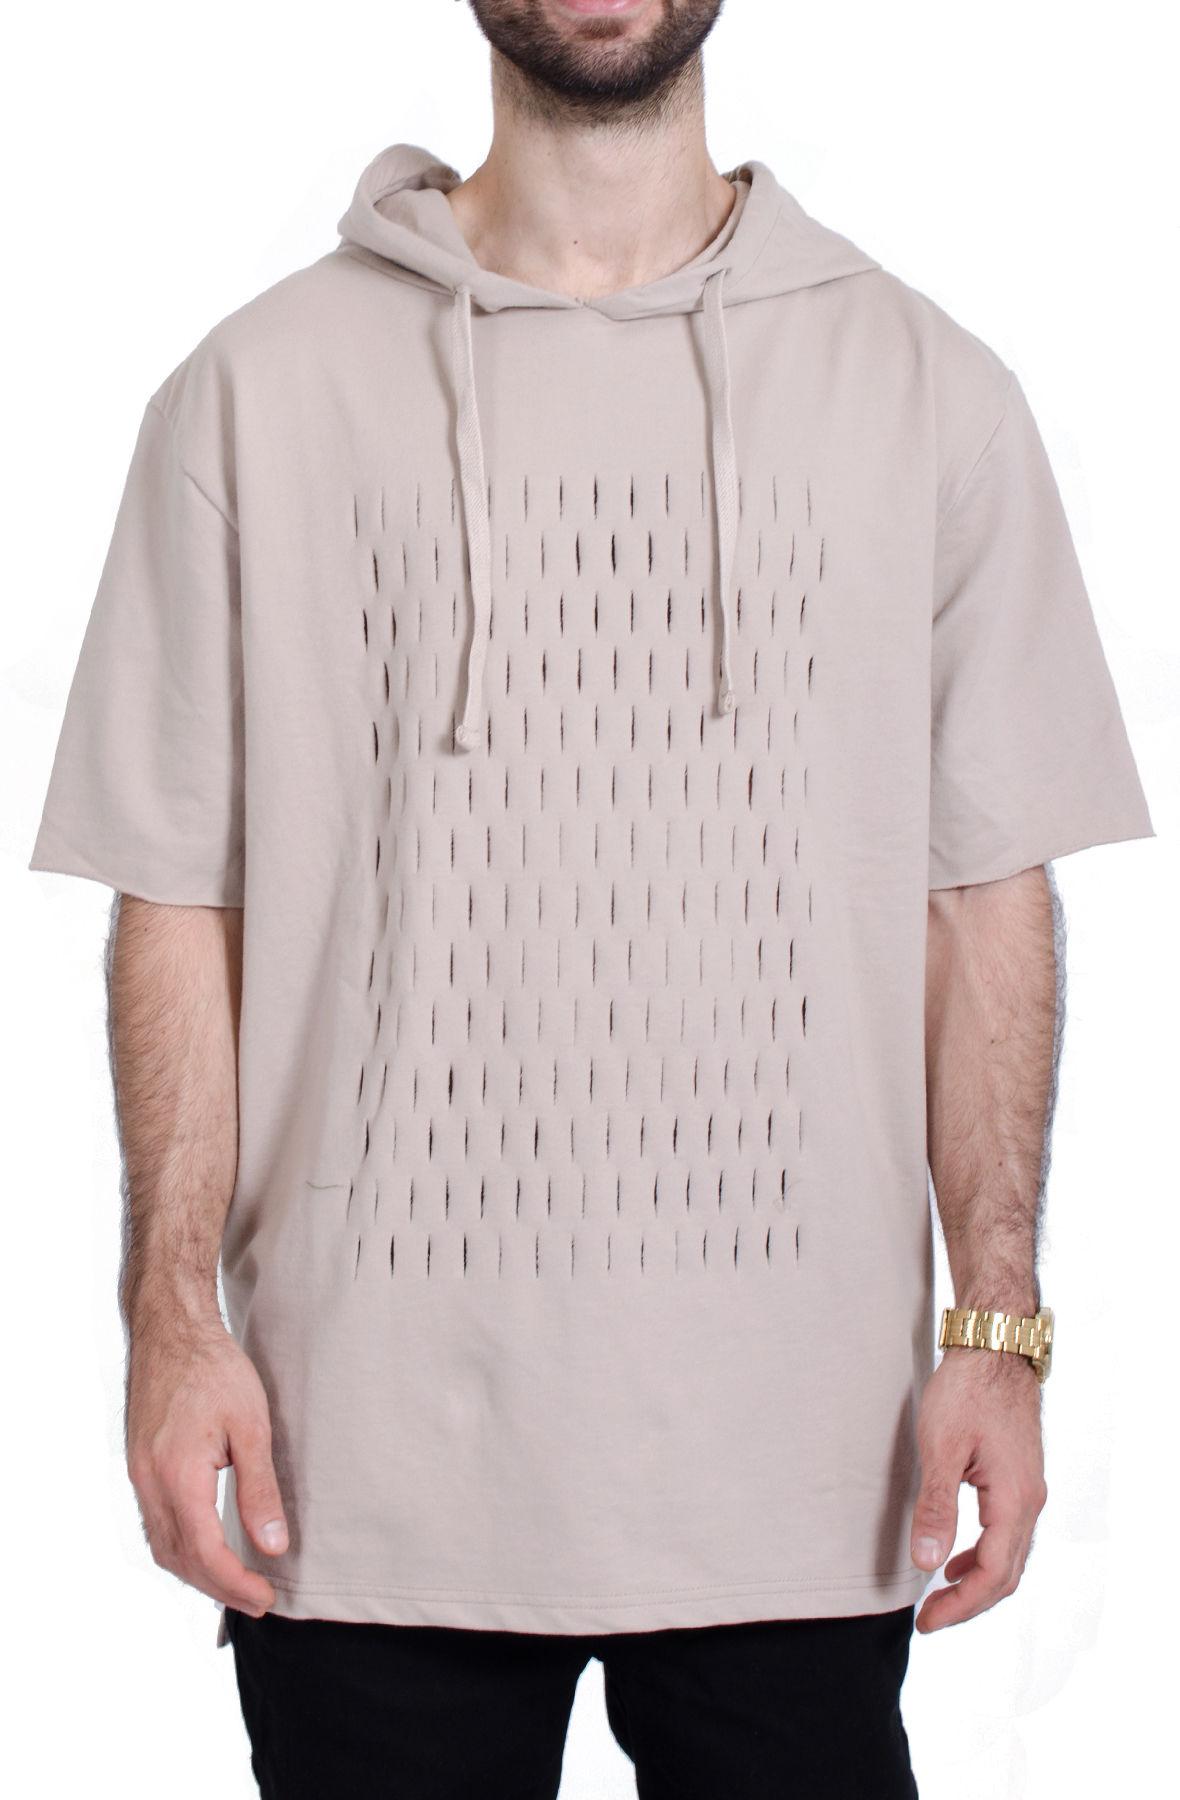 Image of Oversized Razor's Edge Hoodie in Warm Khaki